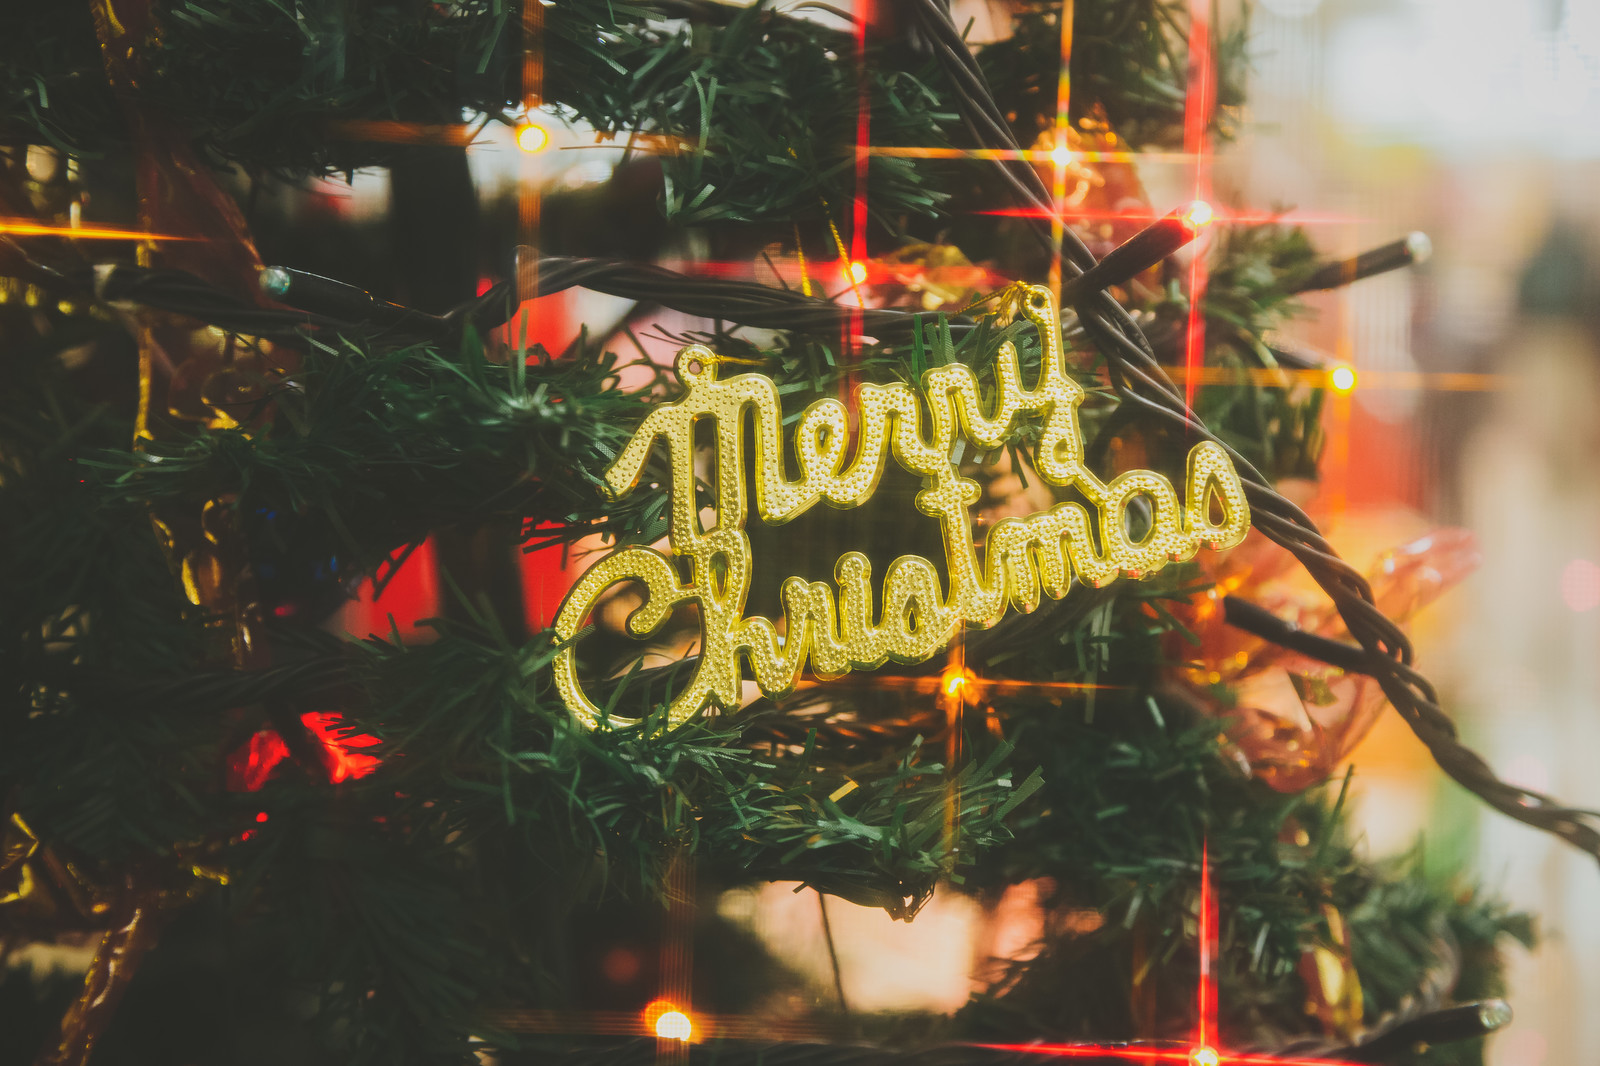 「Merry Christmasの飾りとツリーMerry Christmasの飾りとツリー」のフリー写真素材を拡大